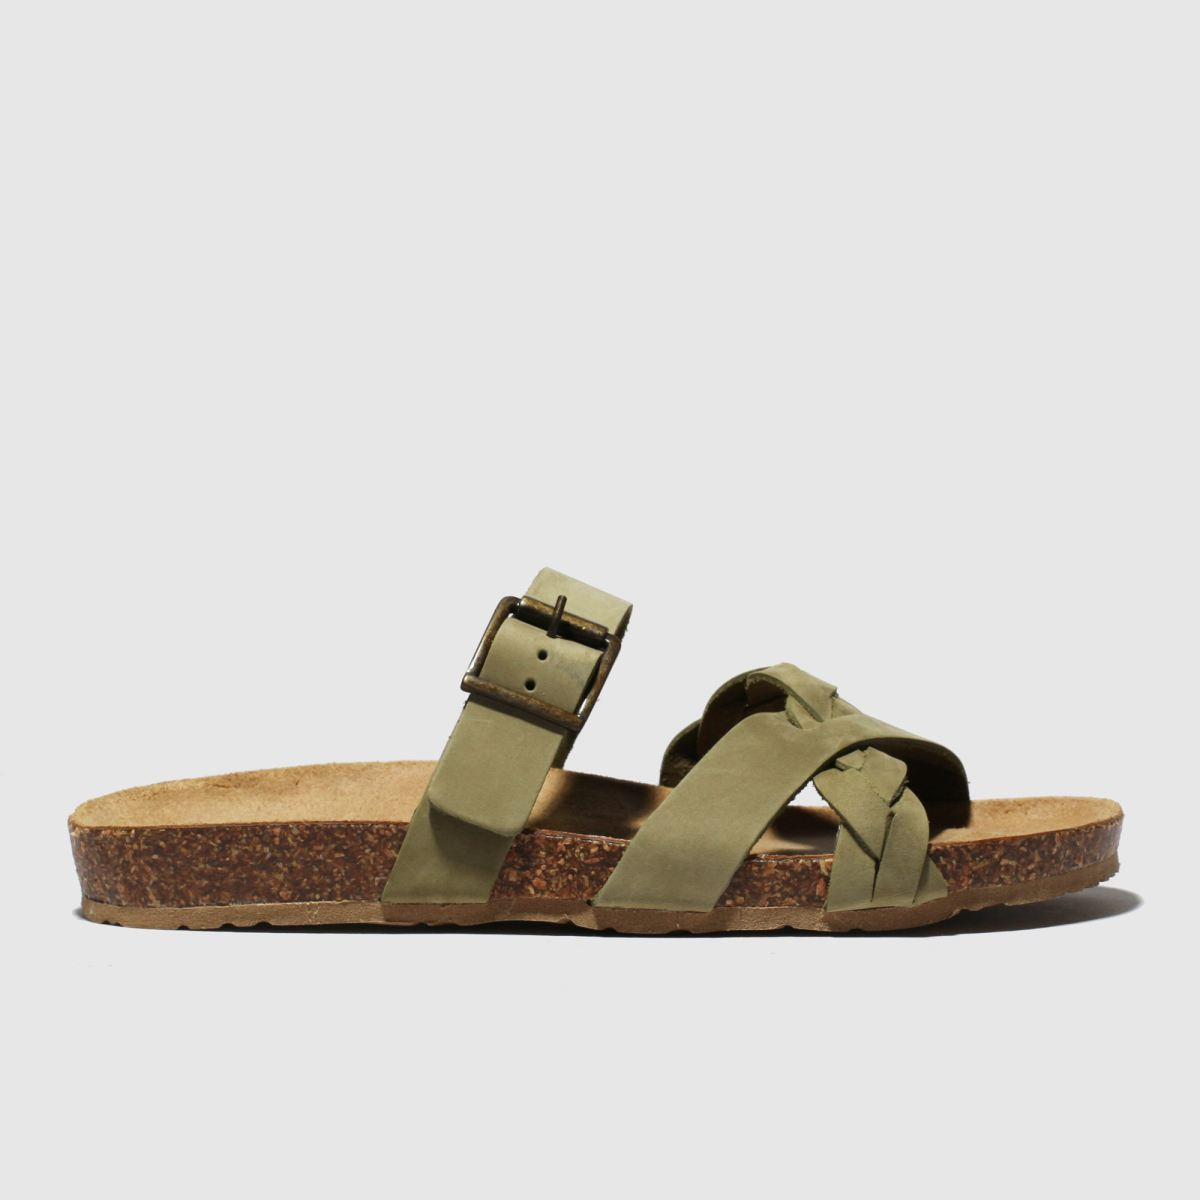 Schuh Khaki Astrology Sandals